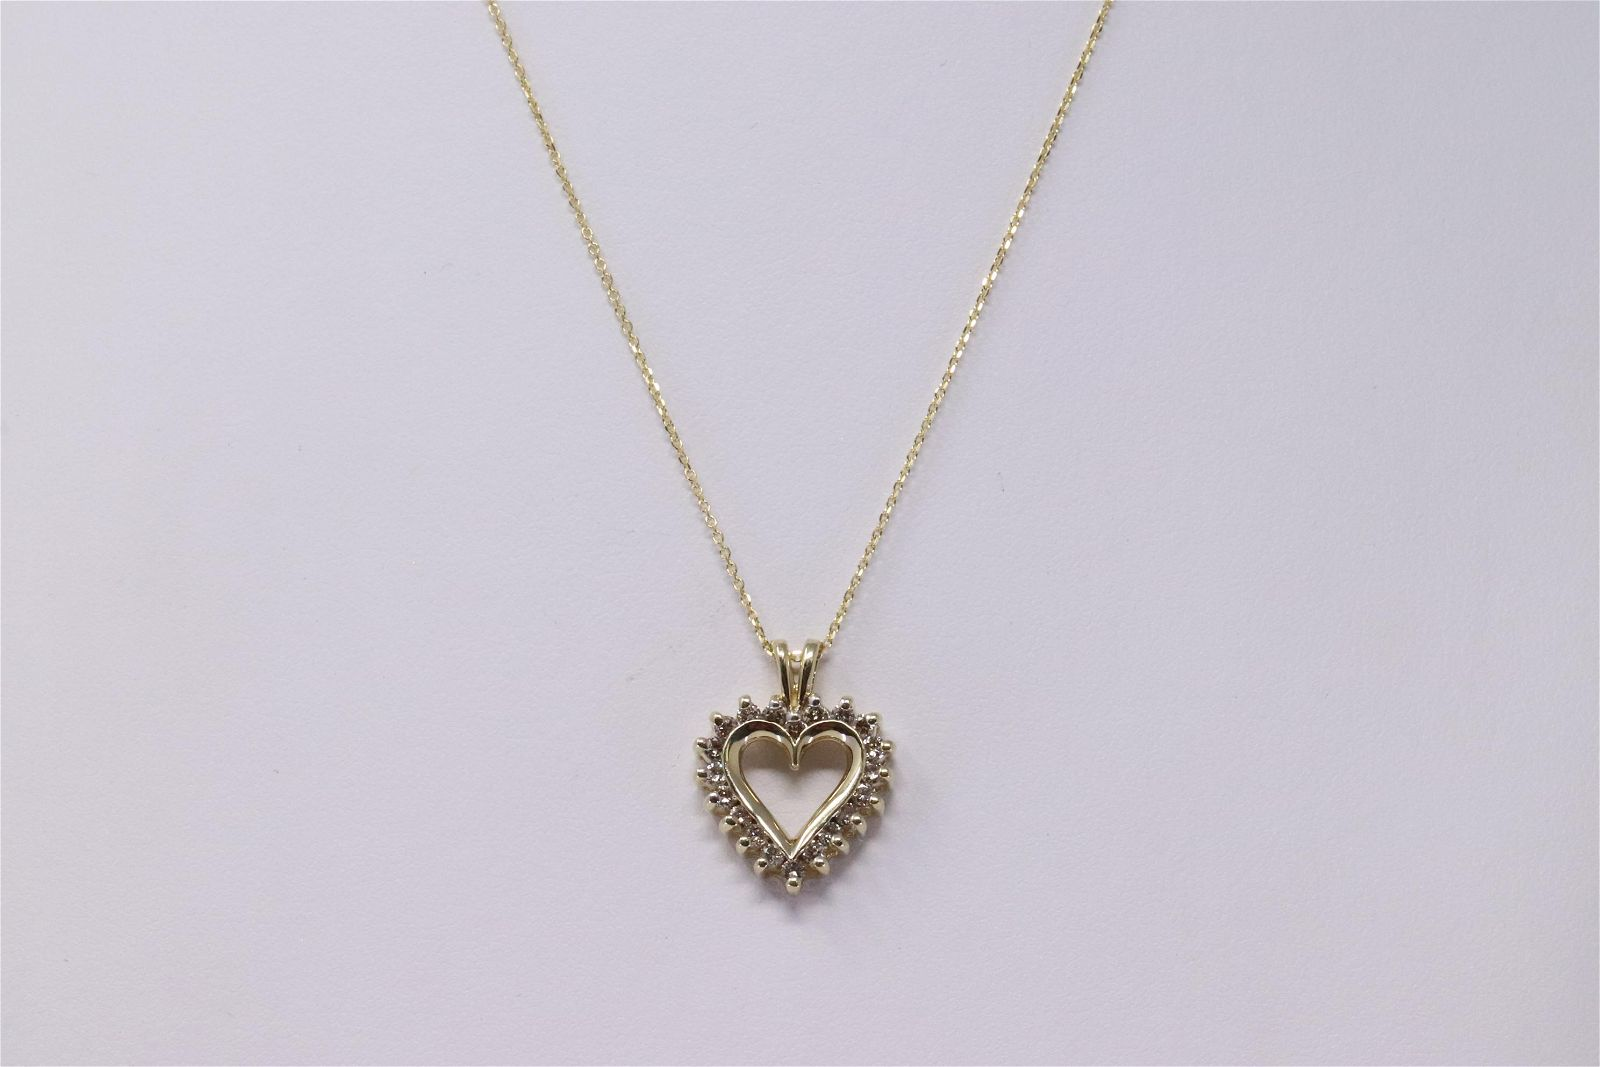 KT Diamond Heart Pendant/14KT Necklace.